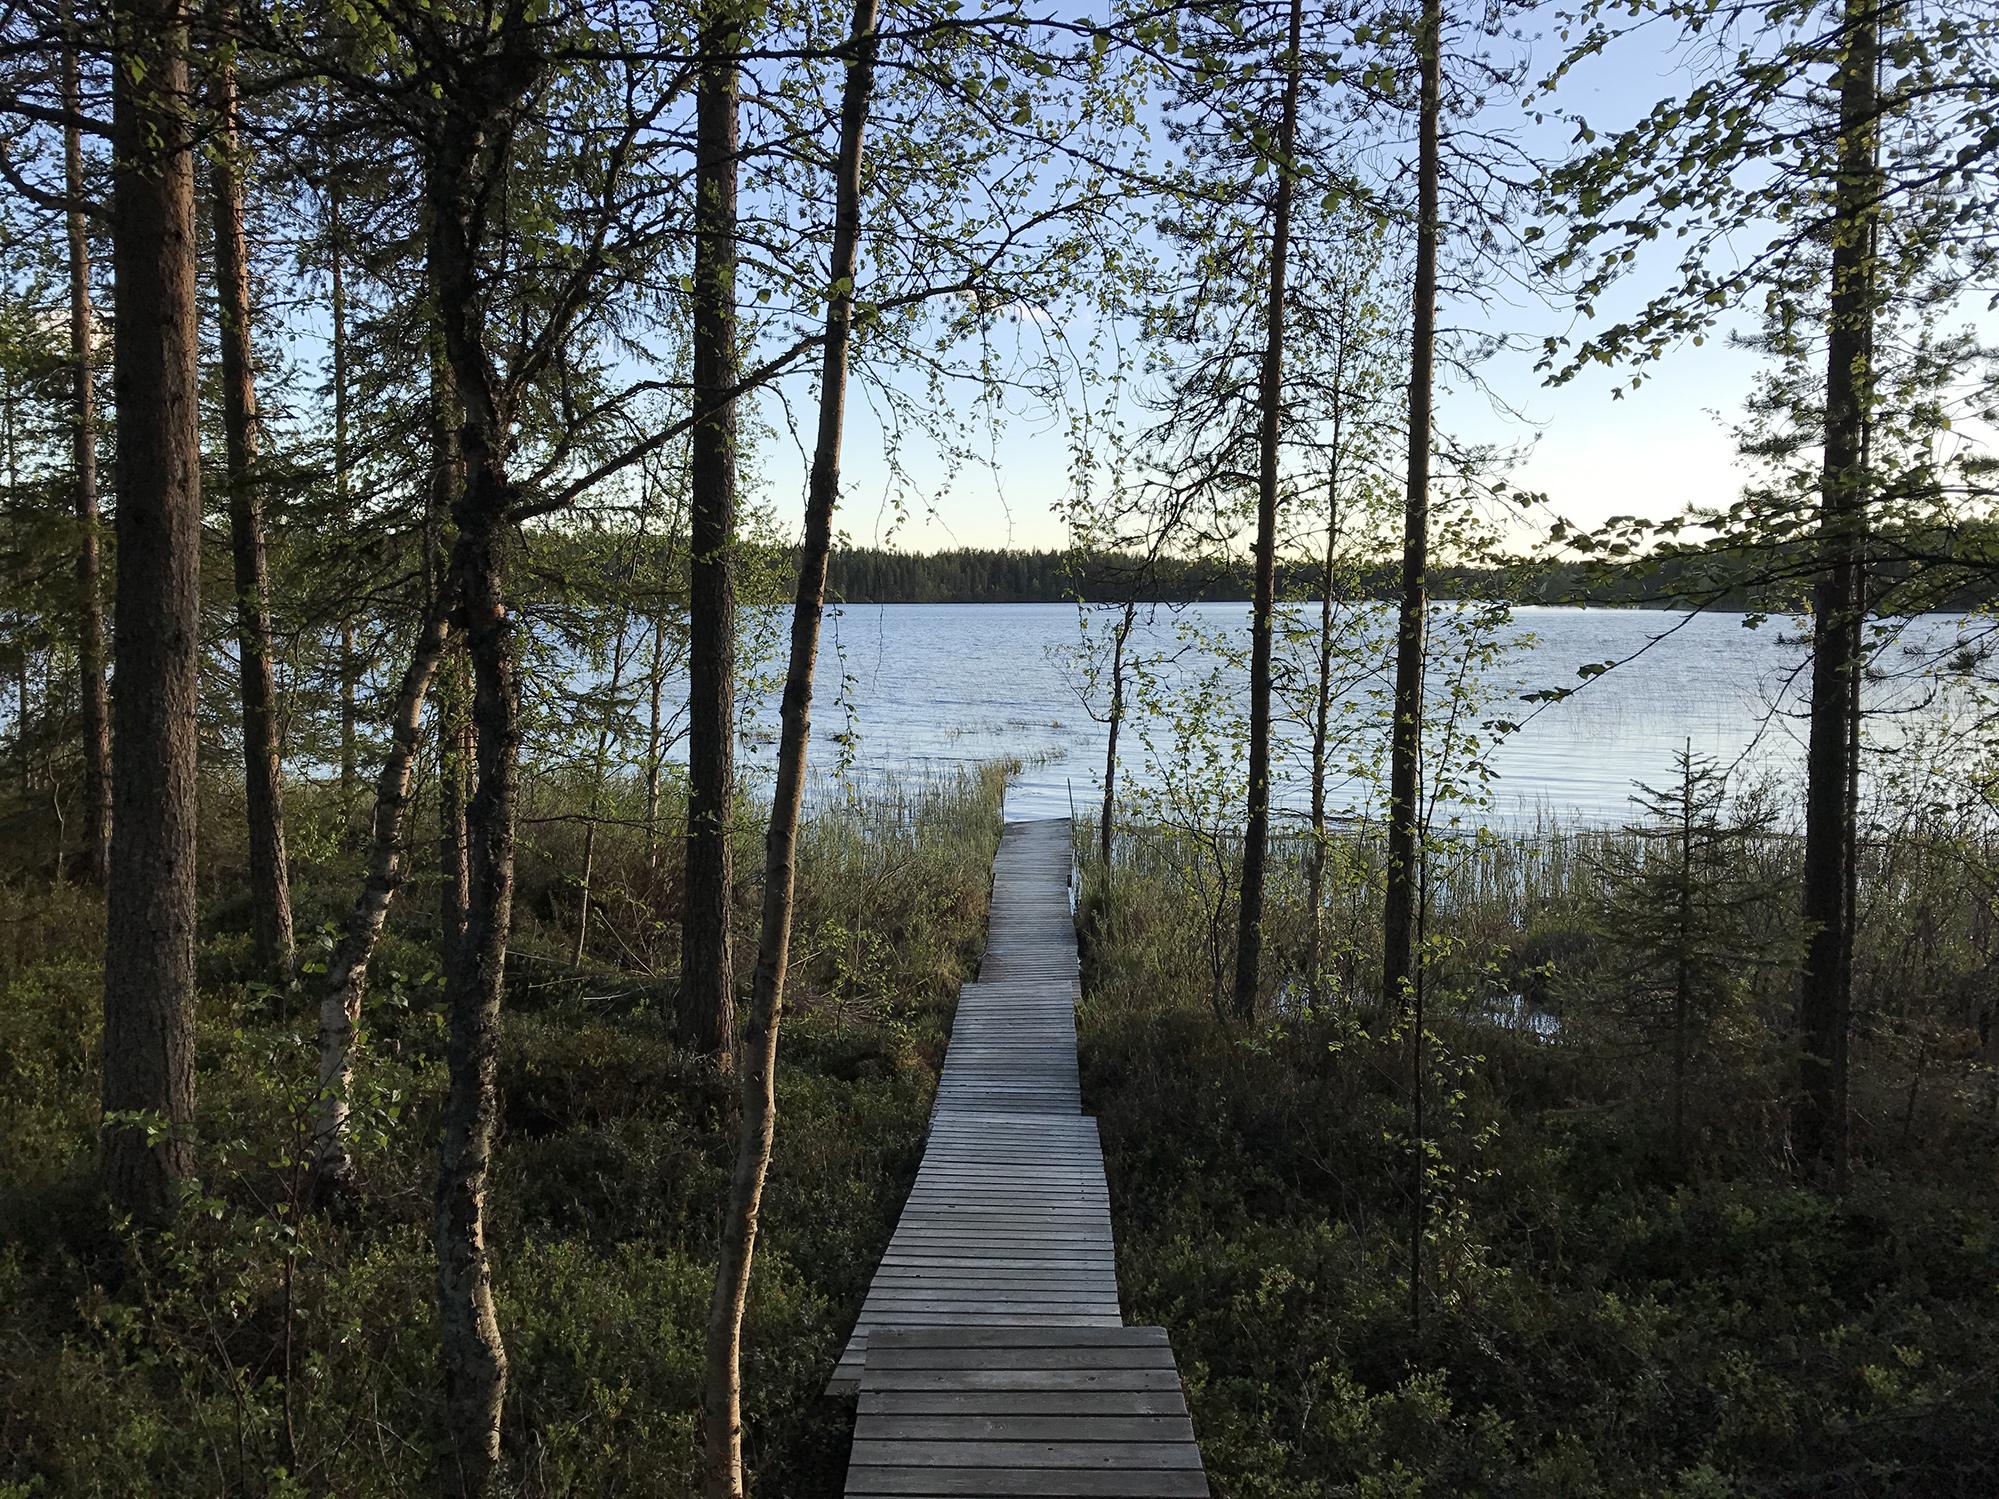 Taking a refreshing bath in lake Pikku-Rävä